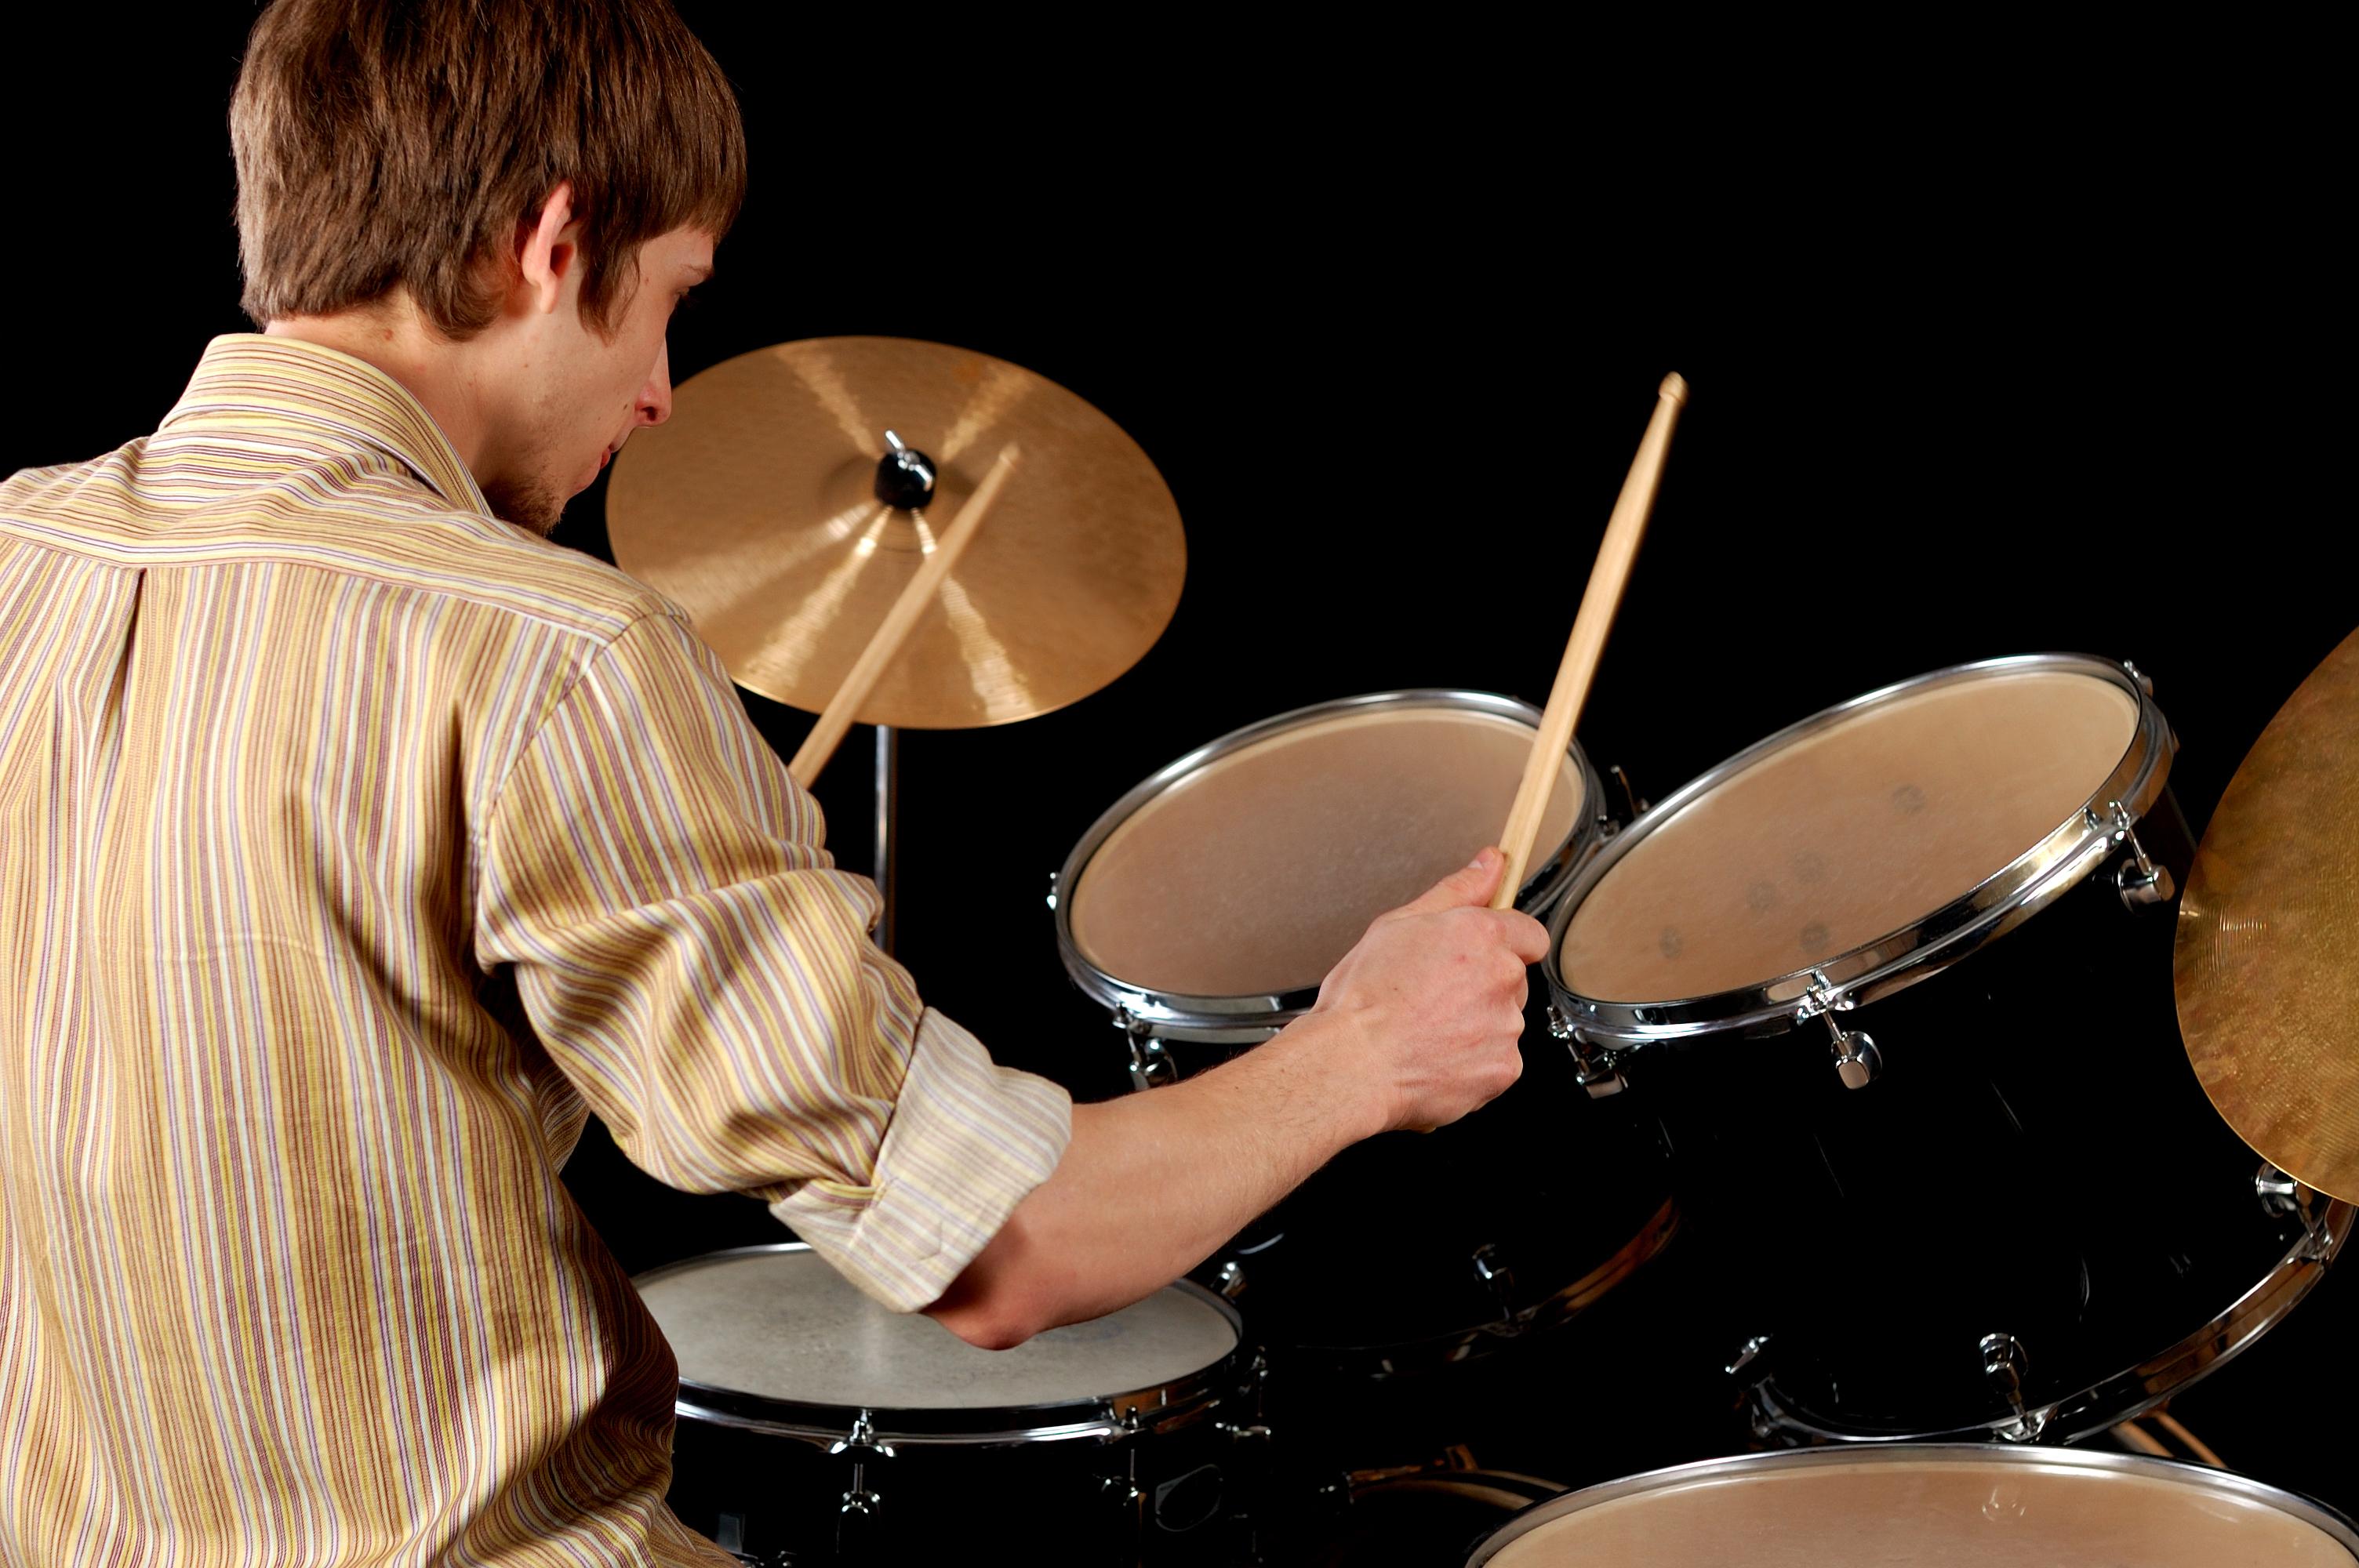 shutterstock_30019645 drums